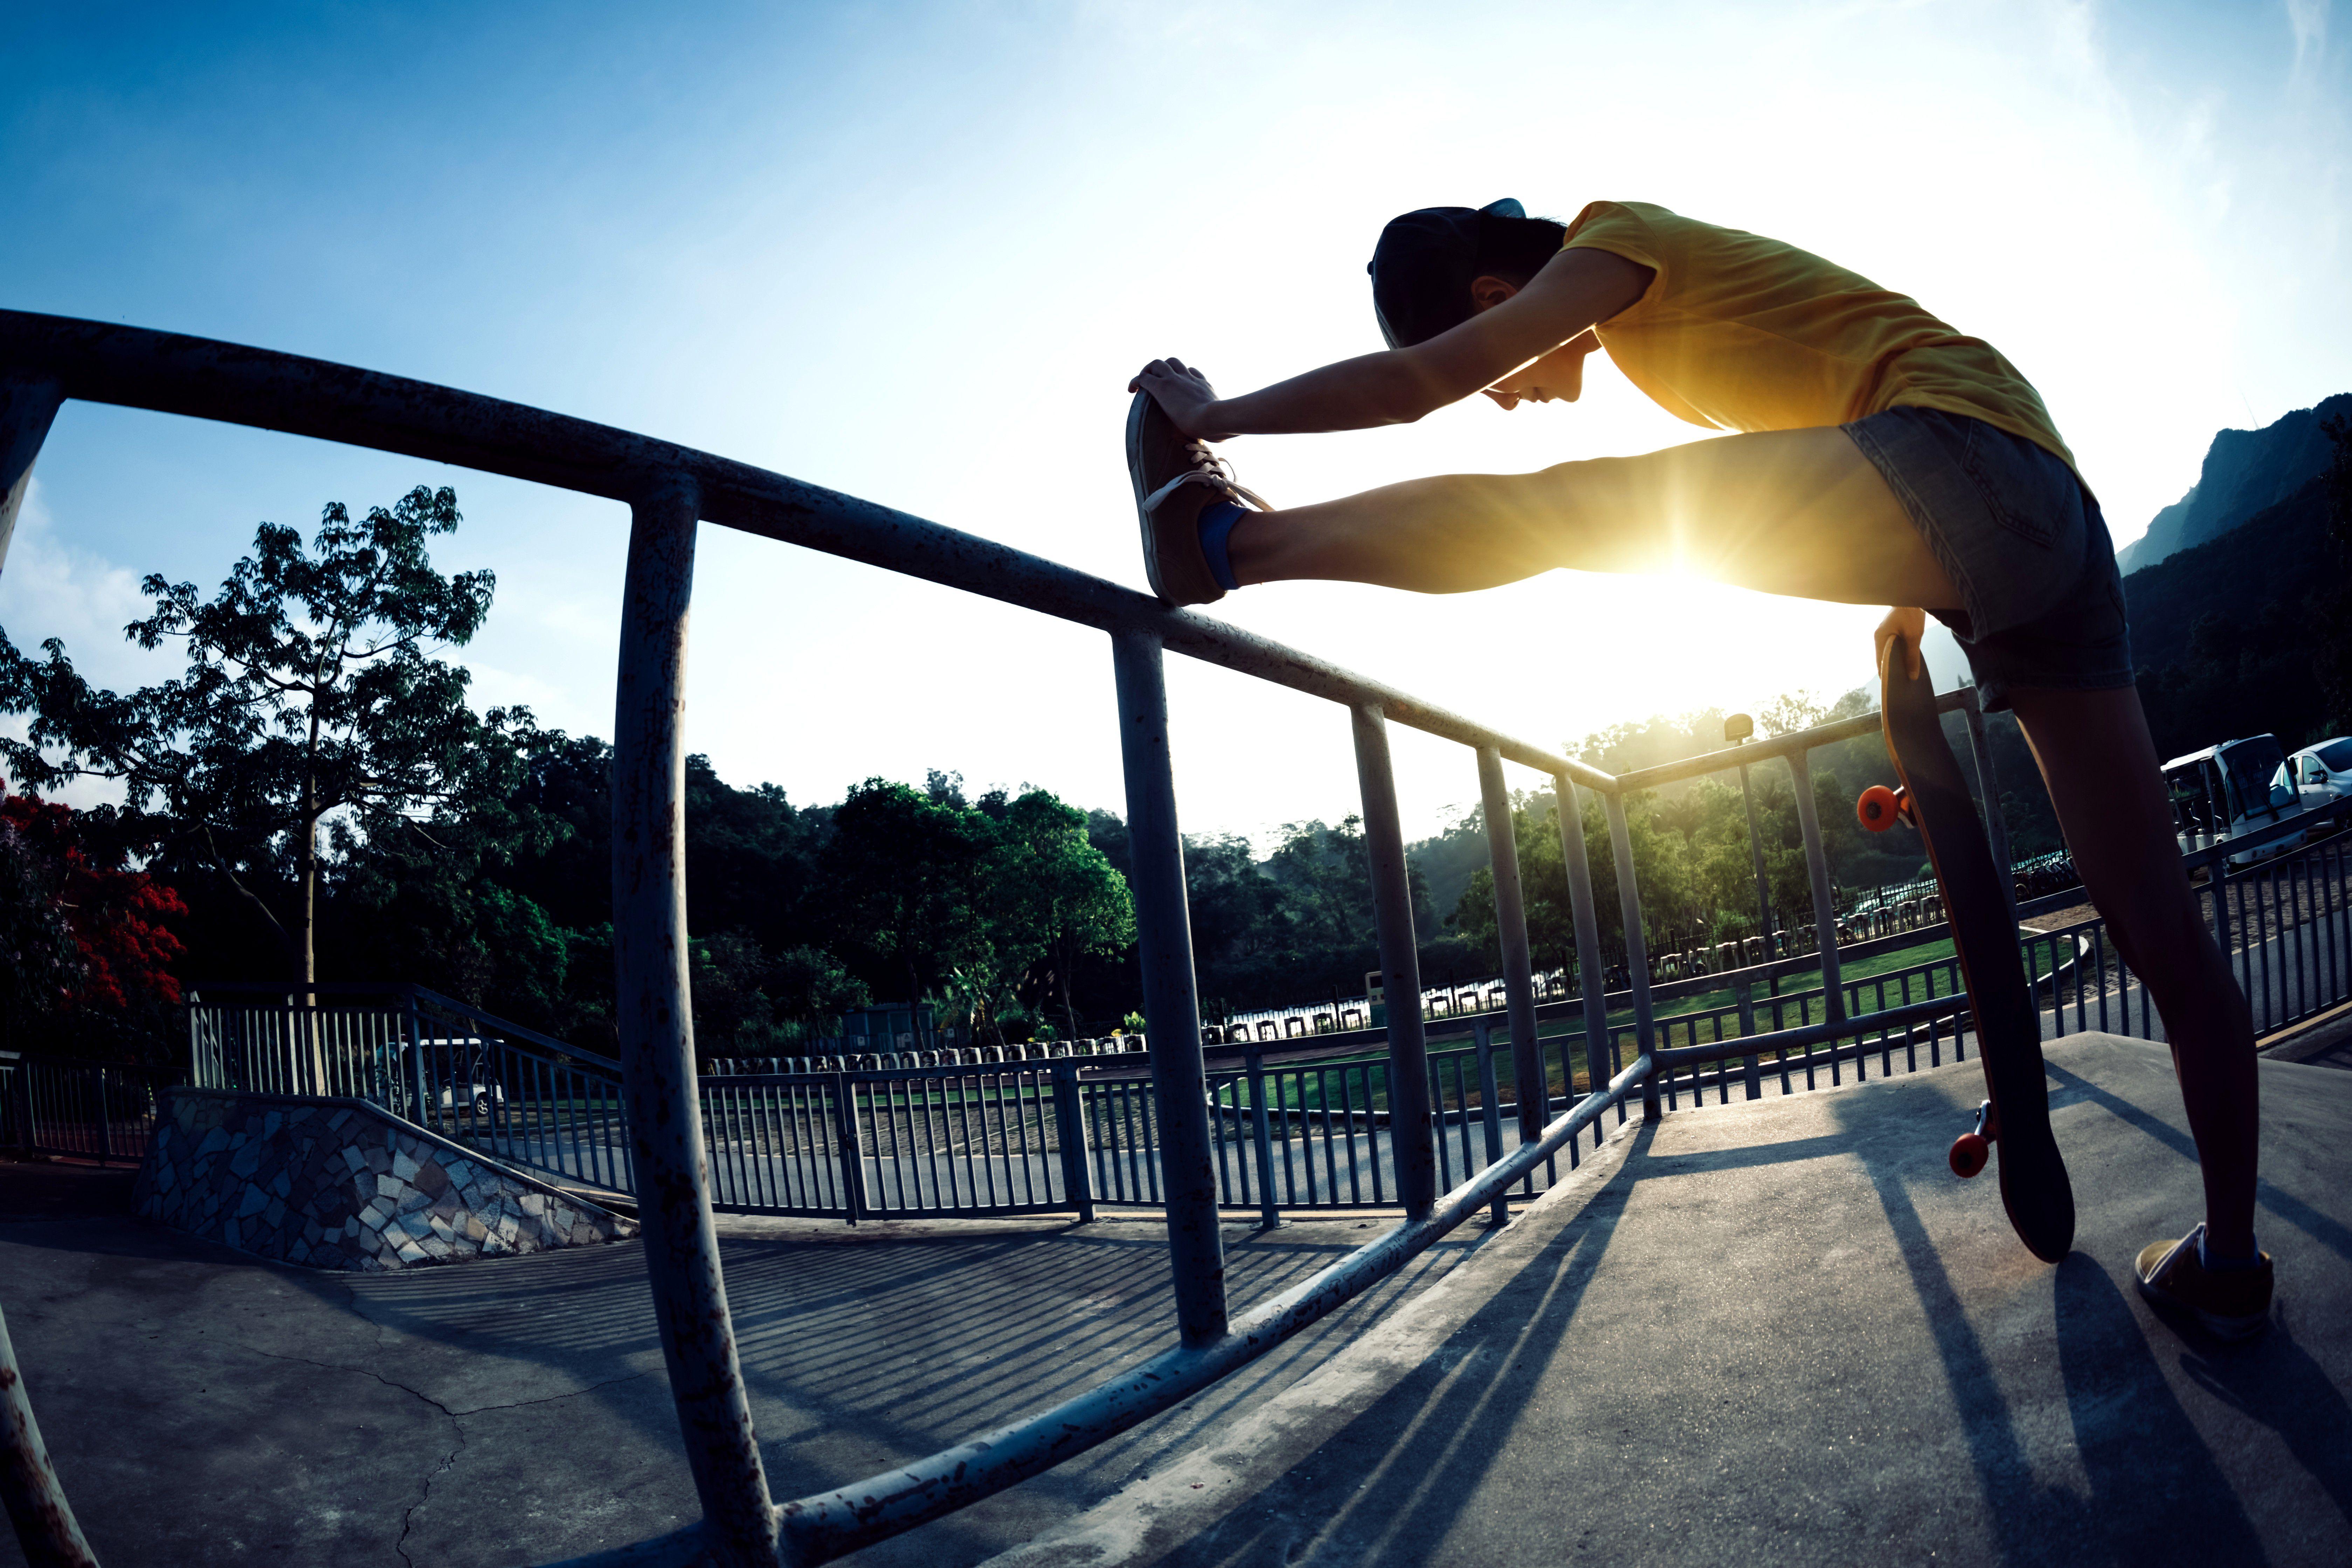 Limbering up at the skatepark